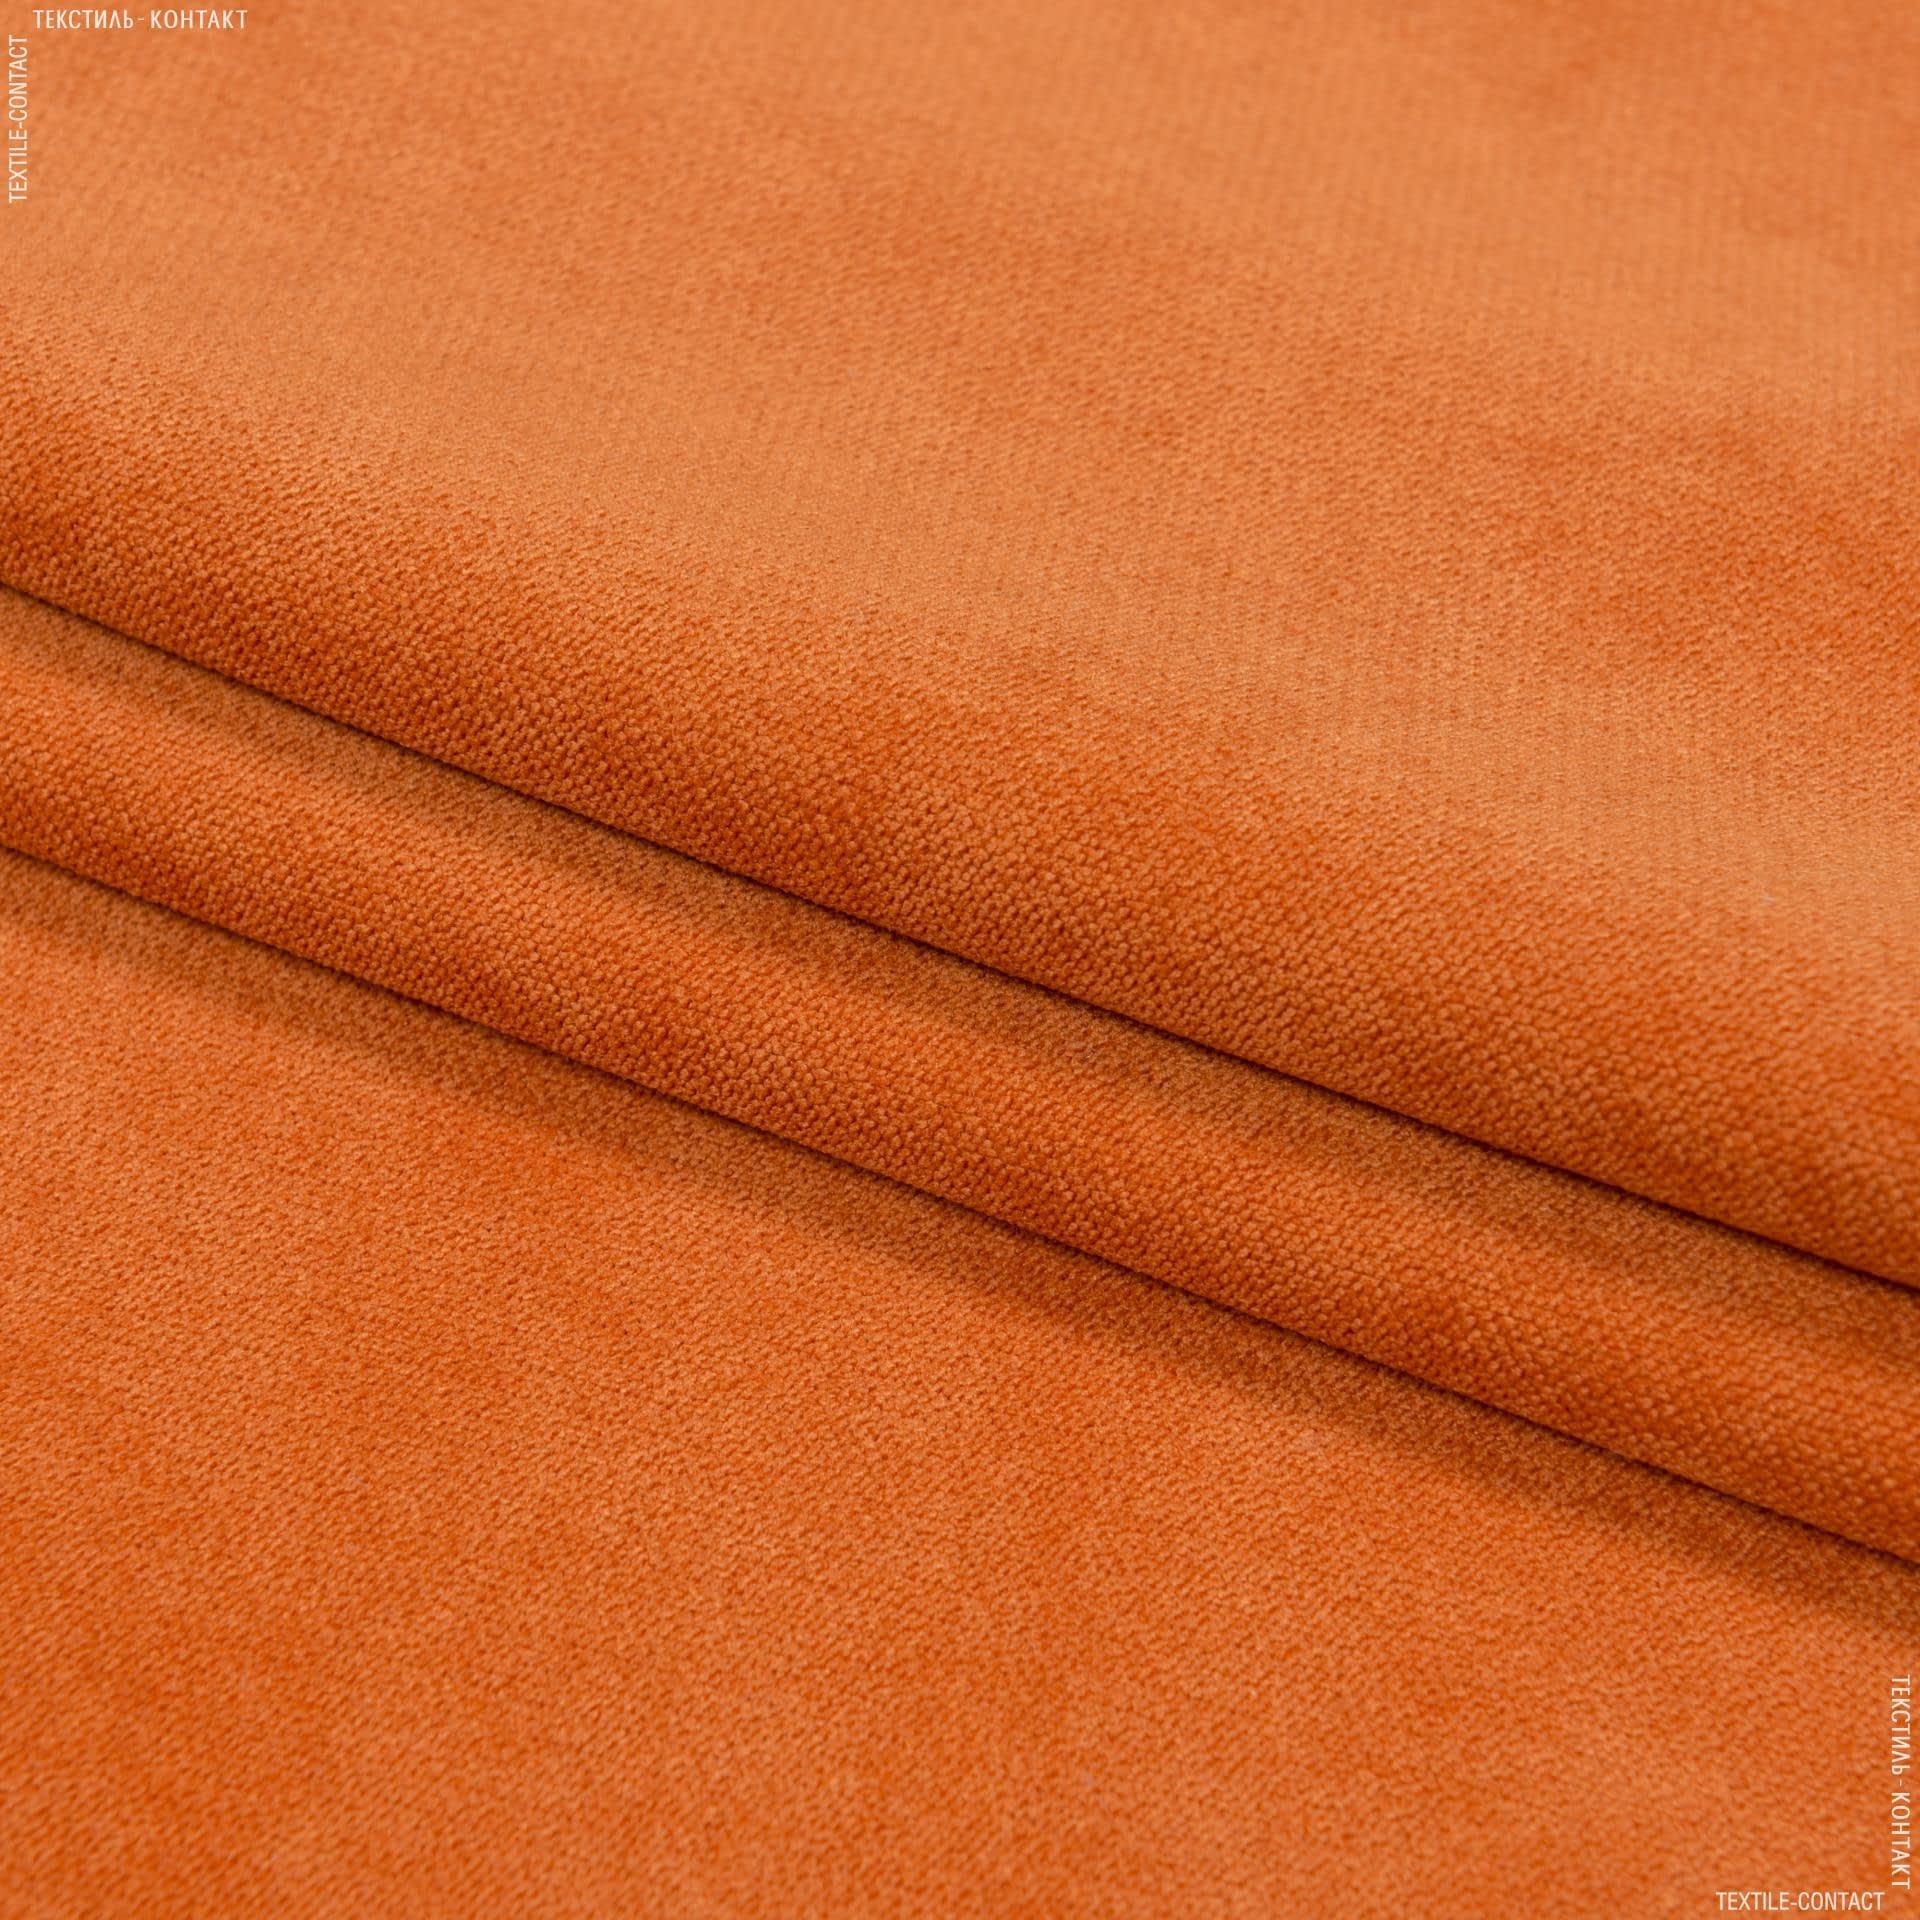 Ткани для мебели - Велюр будапешт/budapest яркий терракот